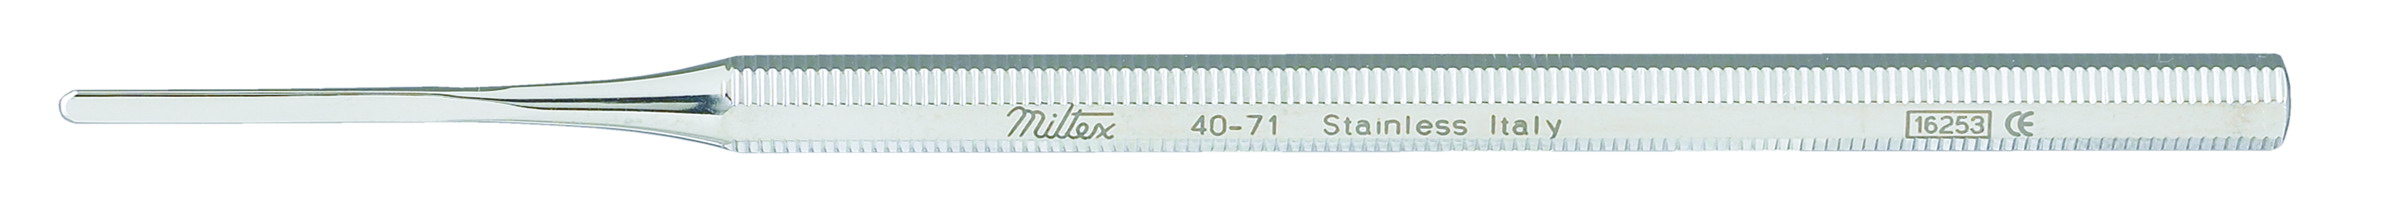 nucleus-knife-2-mm-40-71-miltex.jpg